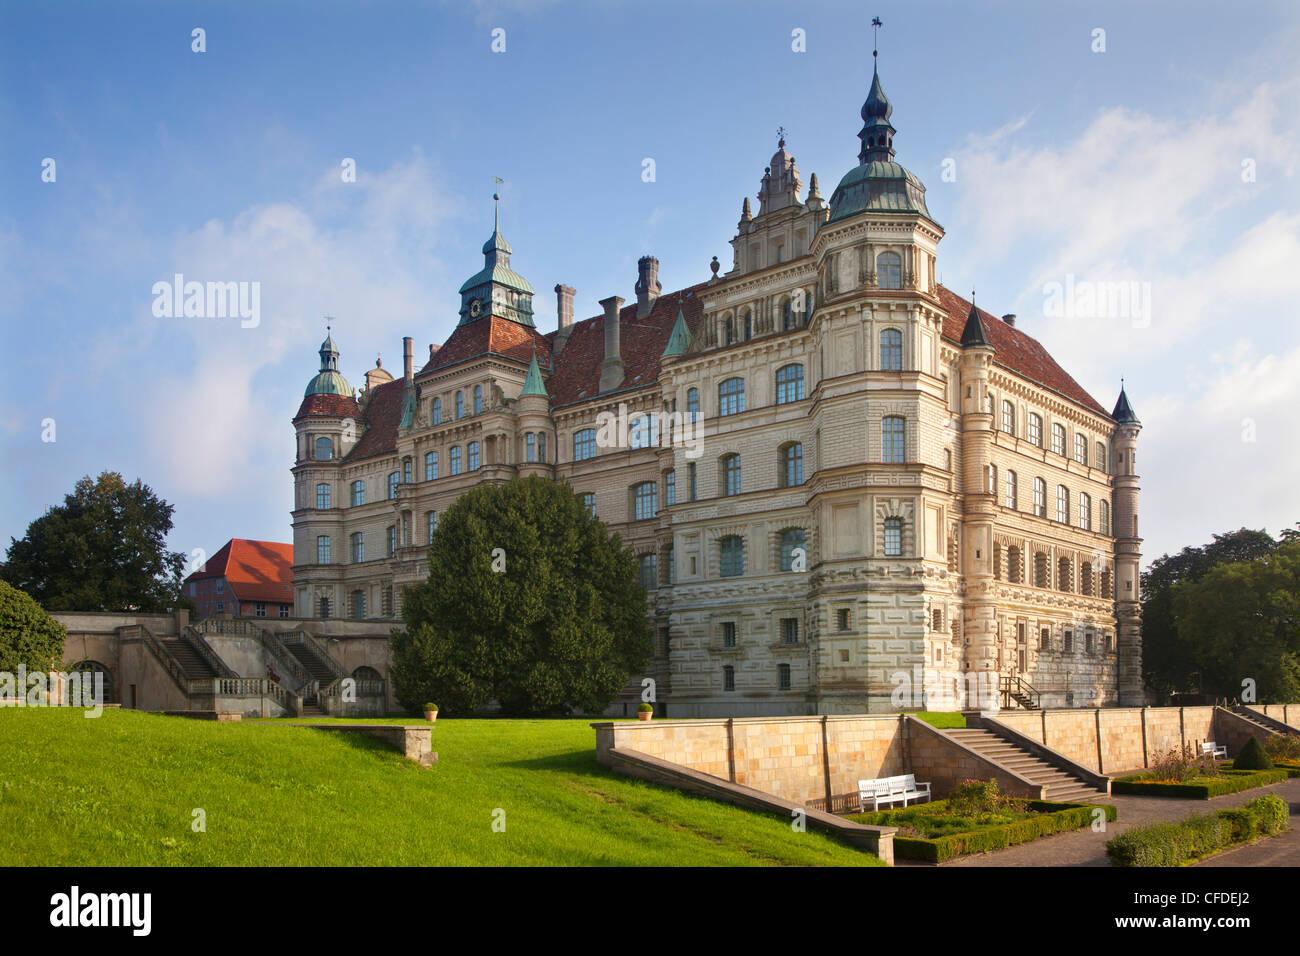 View of Renaissance castle, Guestrow, Mecklenburg switzerland, Mecklenburg Western-Pomerania, Germany, Europe - Stock Image